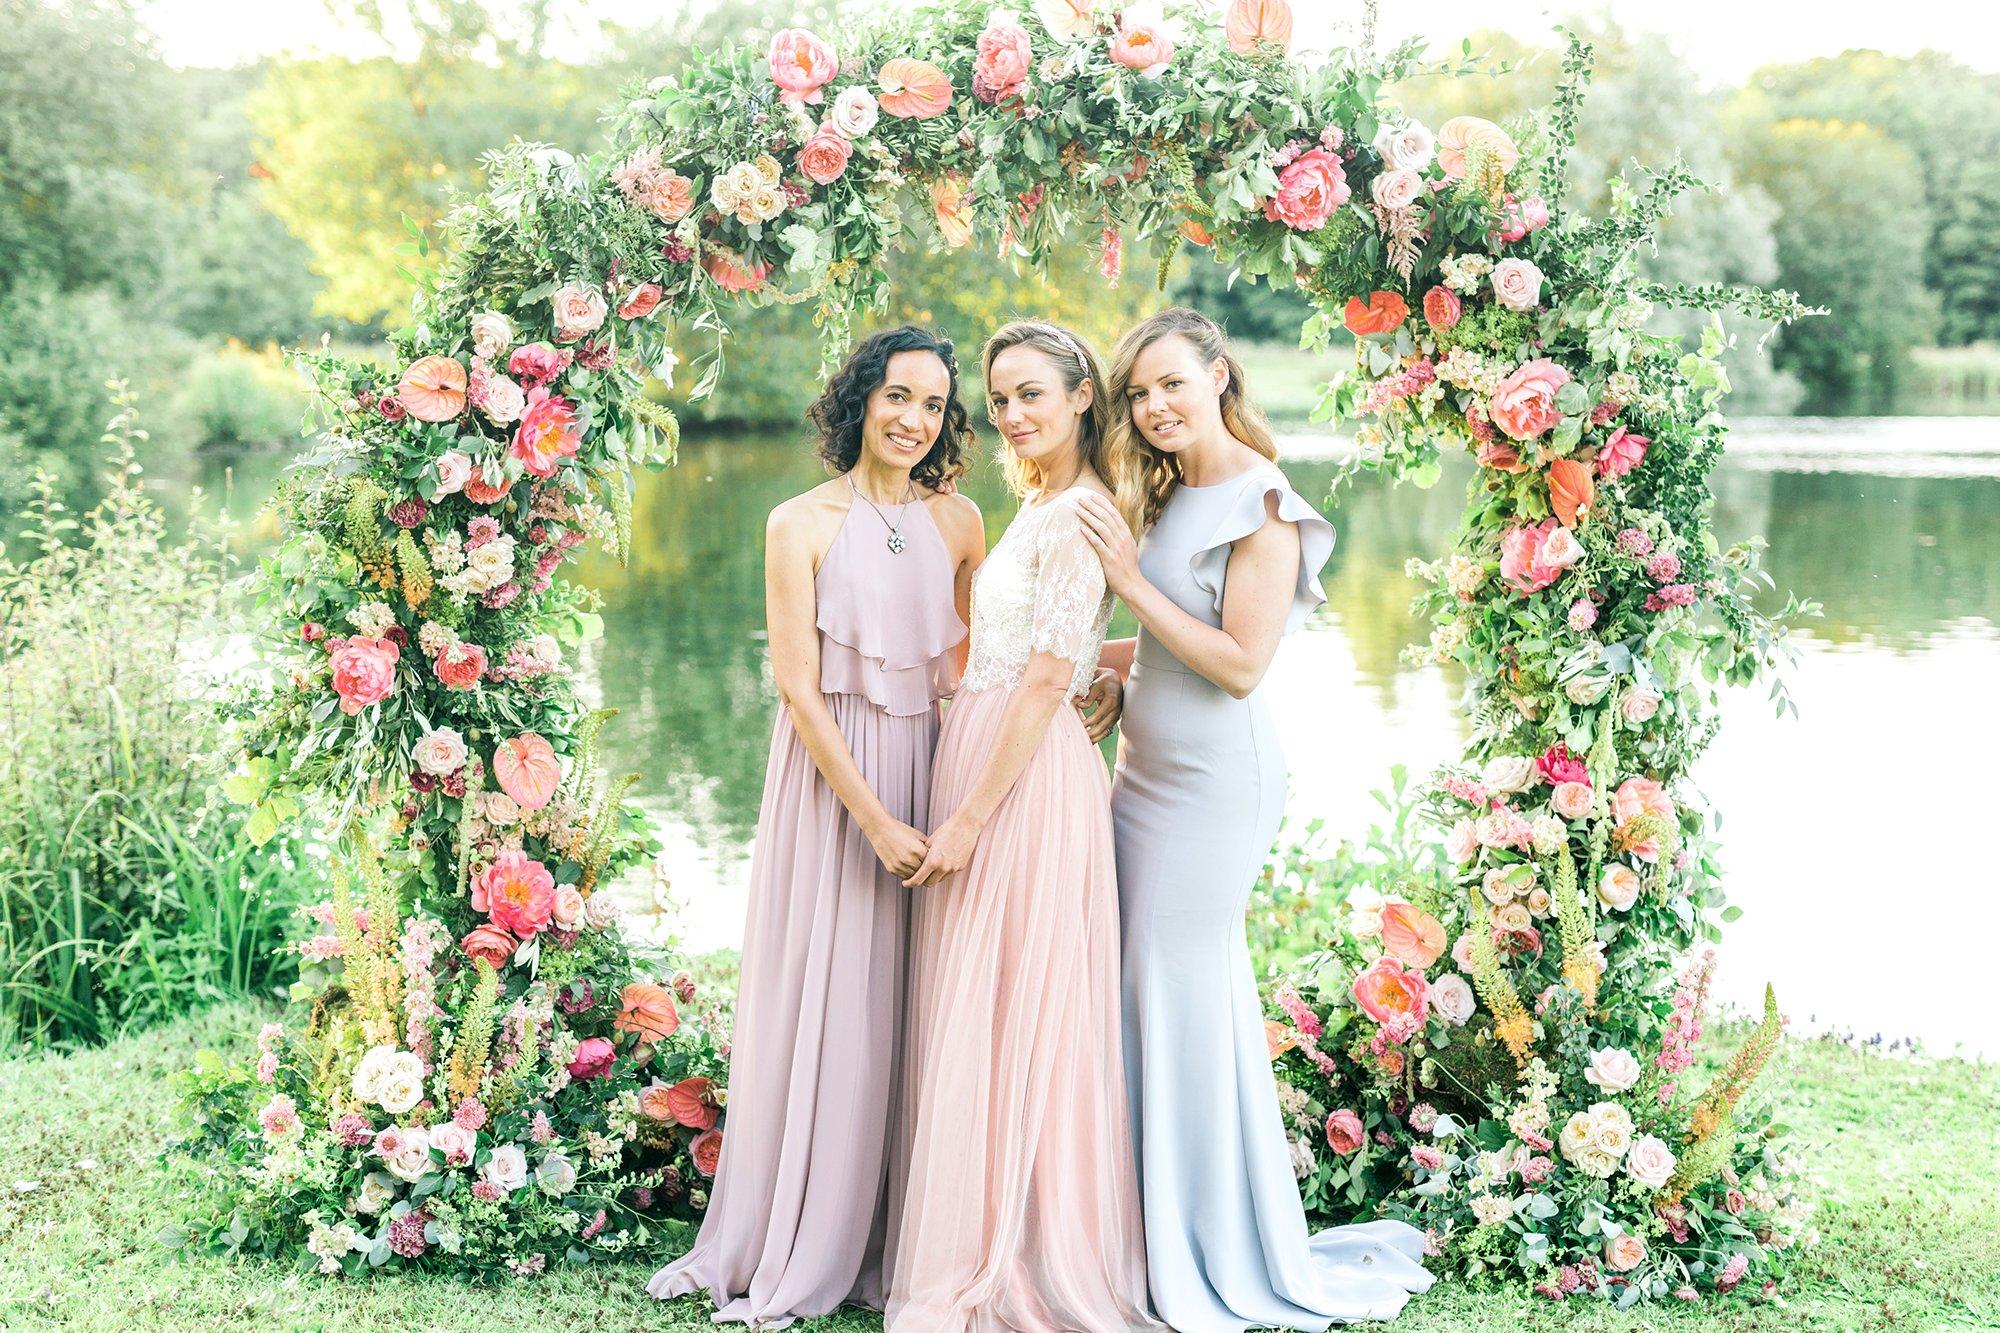 Outdoor Summer Wedding Inspiration, Flamboyant Invites